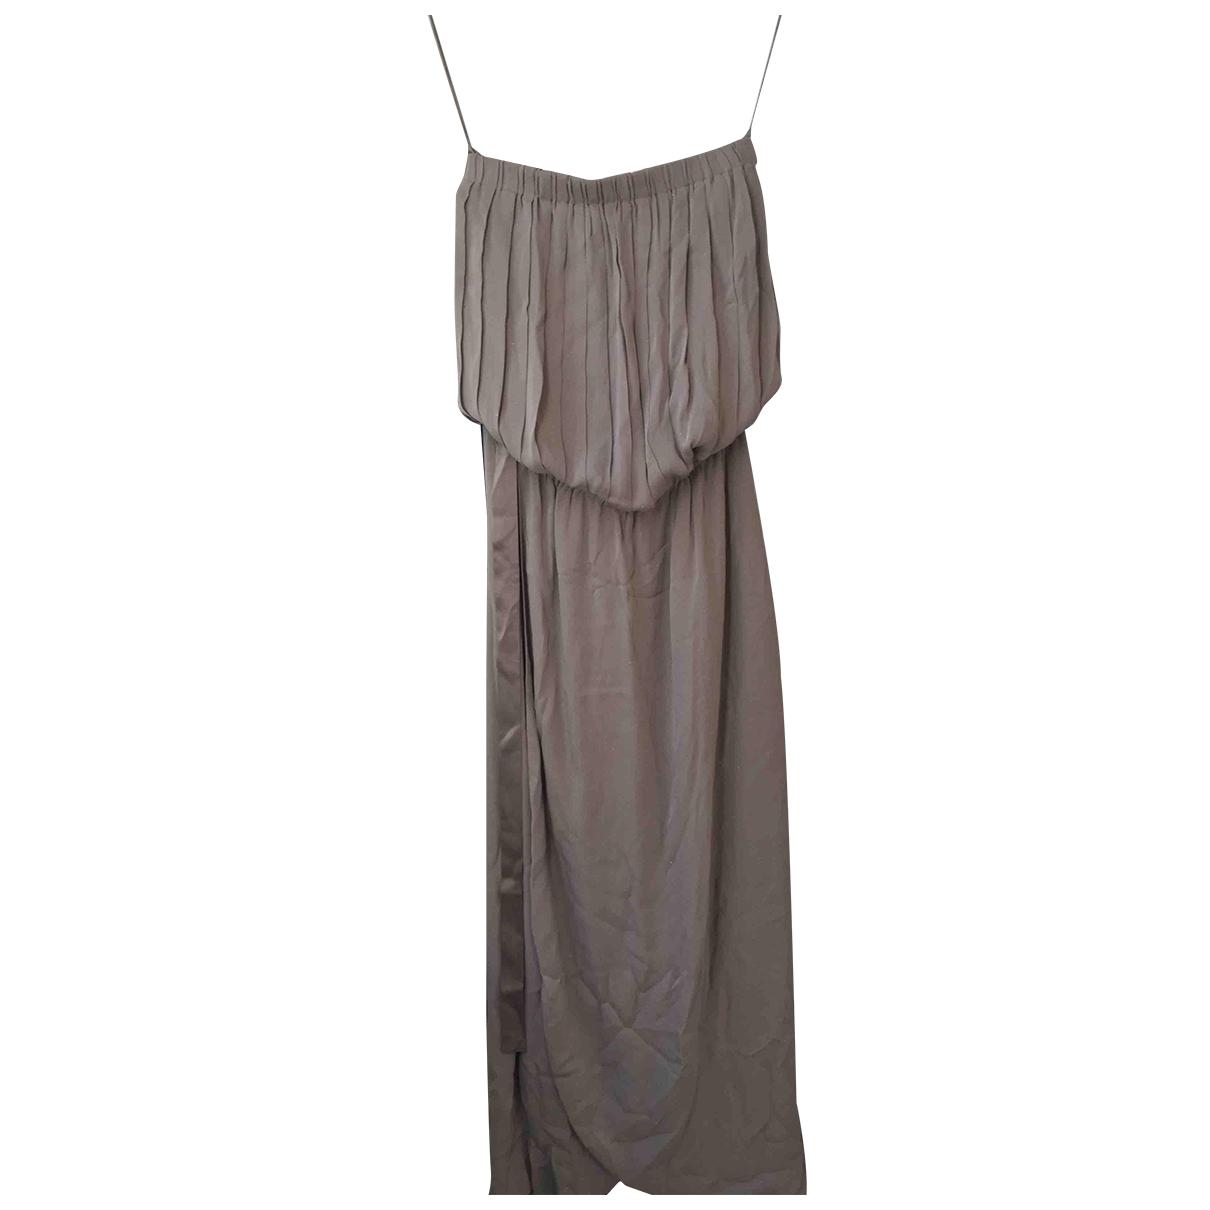 Alice & Olivia \N Grey Silk dress for Women M International